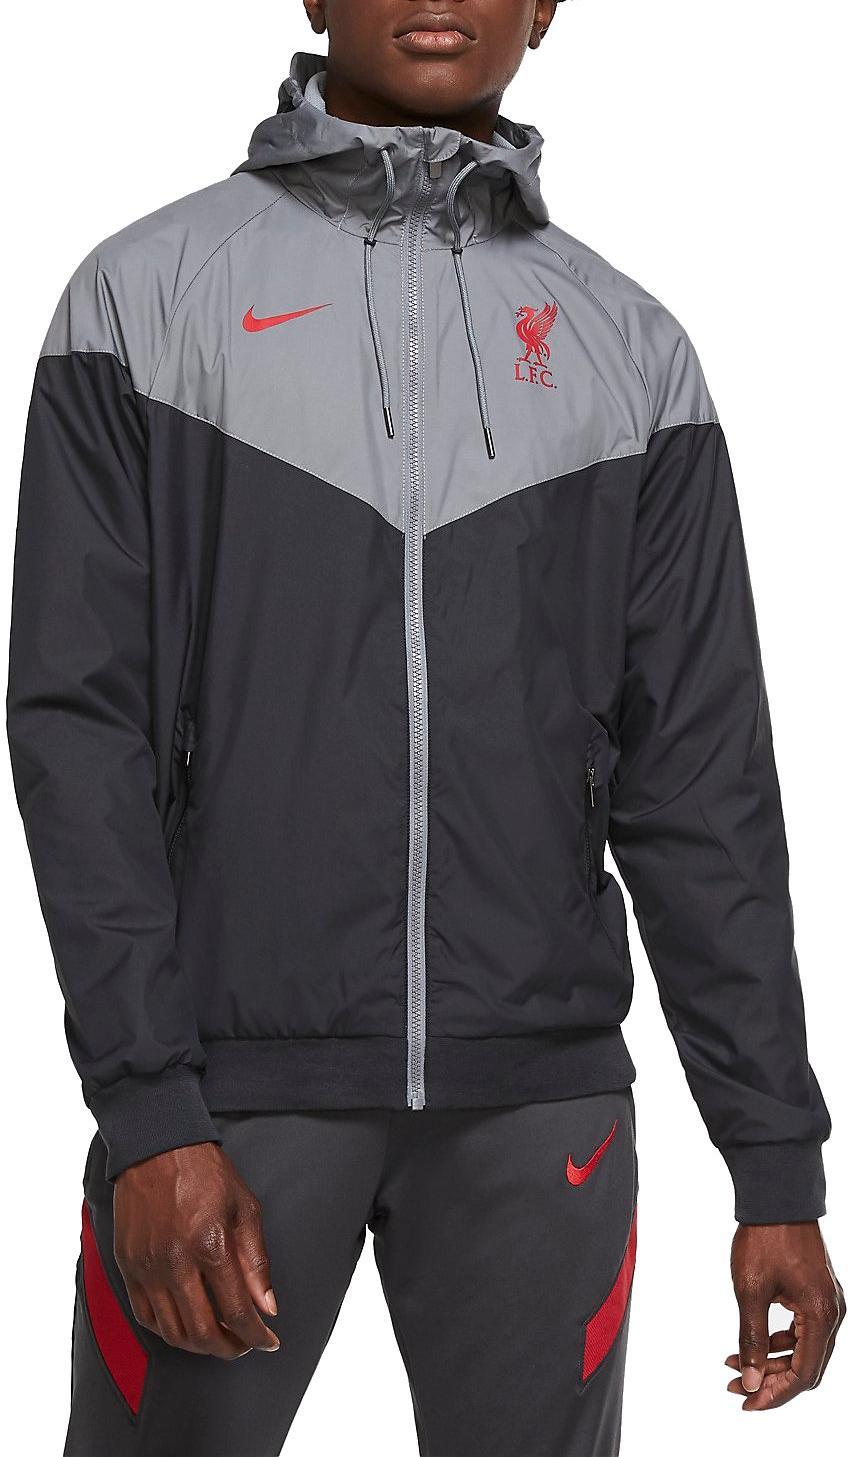 Chaqueta Con Capucha Nike M Liverpool Fc Windrunner Jacket 11teamsports Es